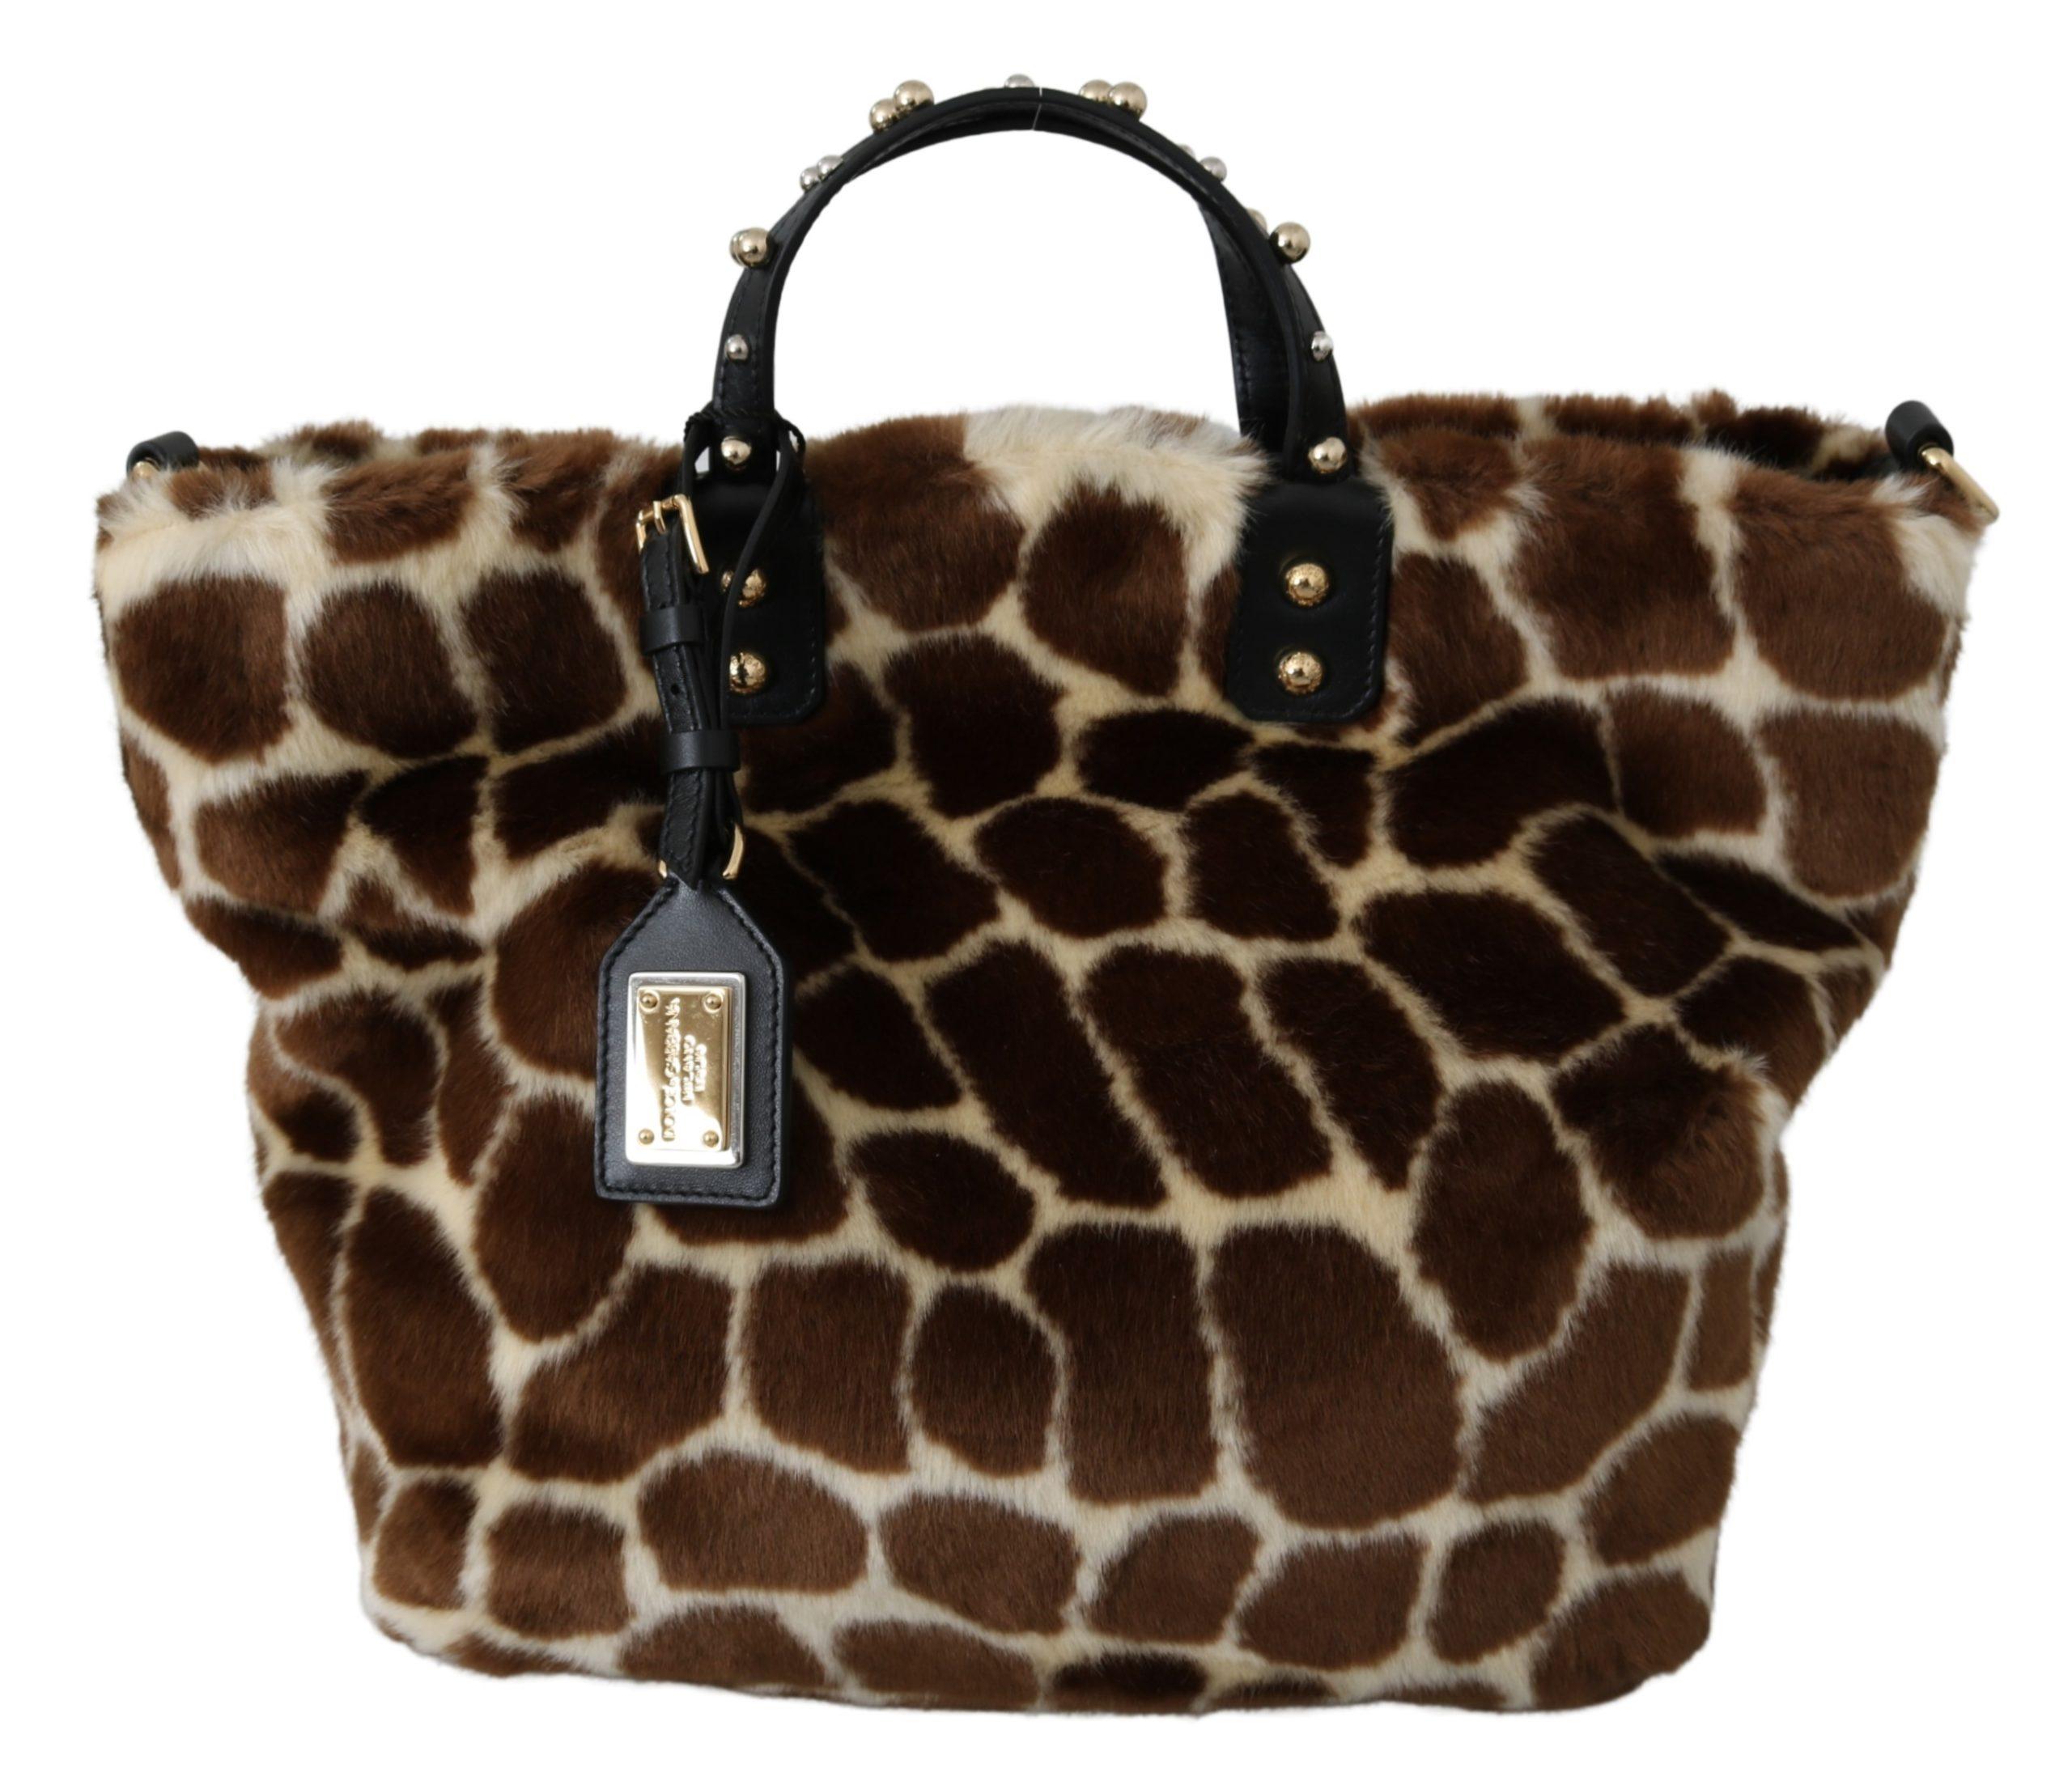 Dolce & Gabbana Women's Giraffe Print Shopping Tote Bag Brown VAS9798